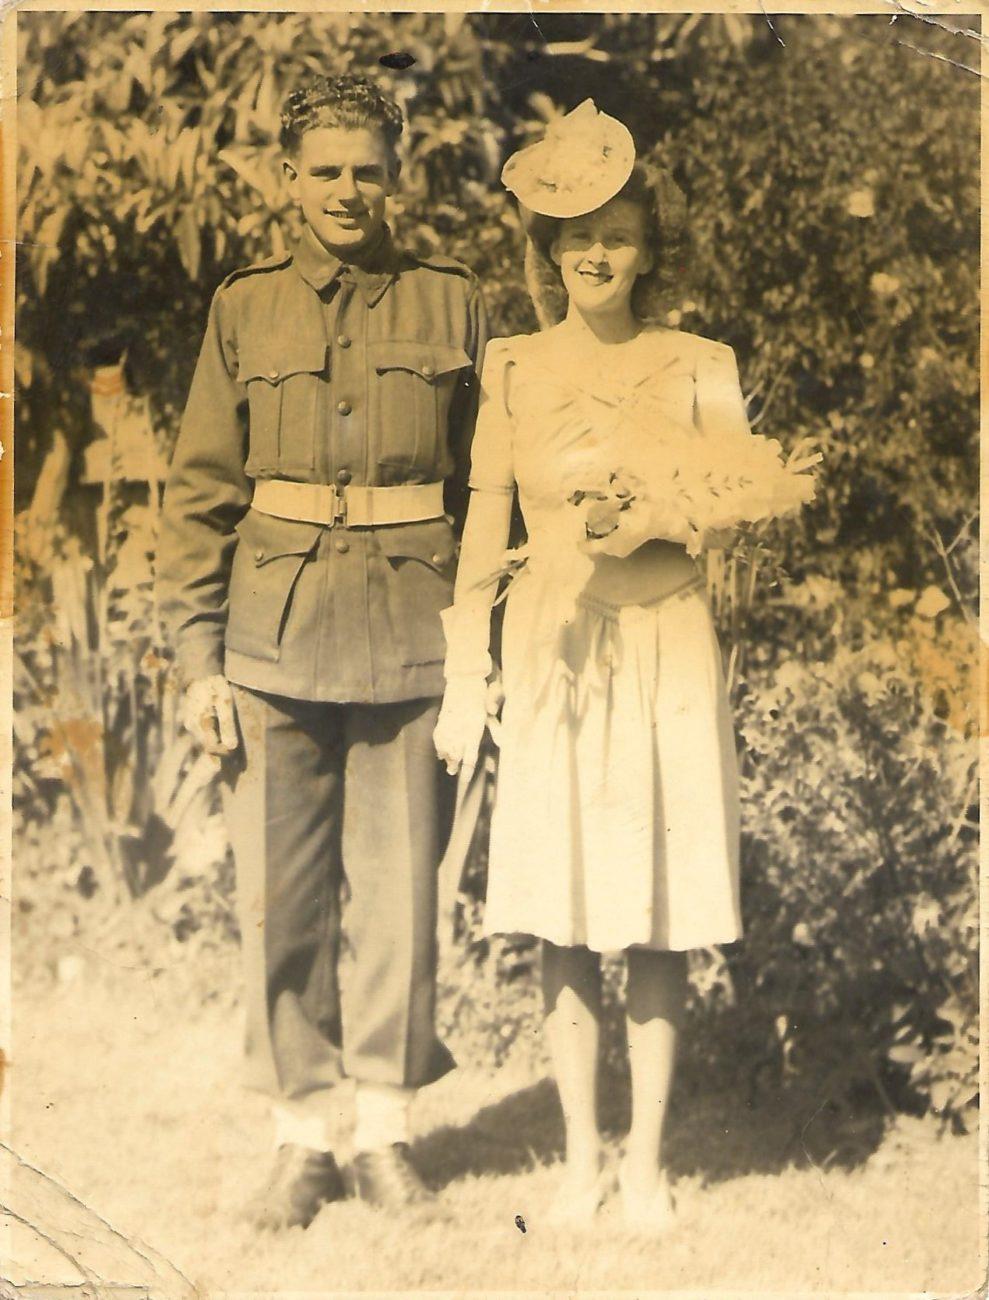 Harry Baldwin & Mollie Sheppard on their wedding day (27/09/1940?)